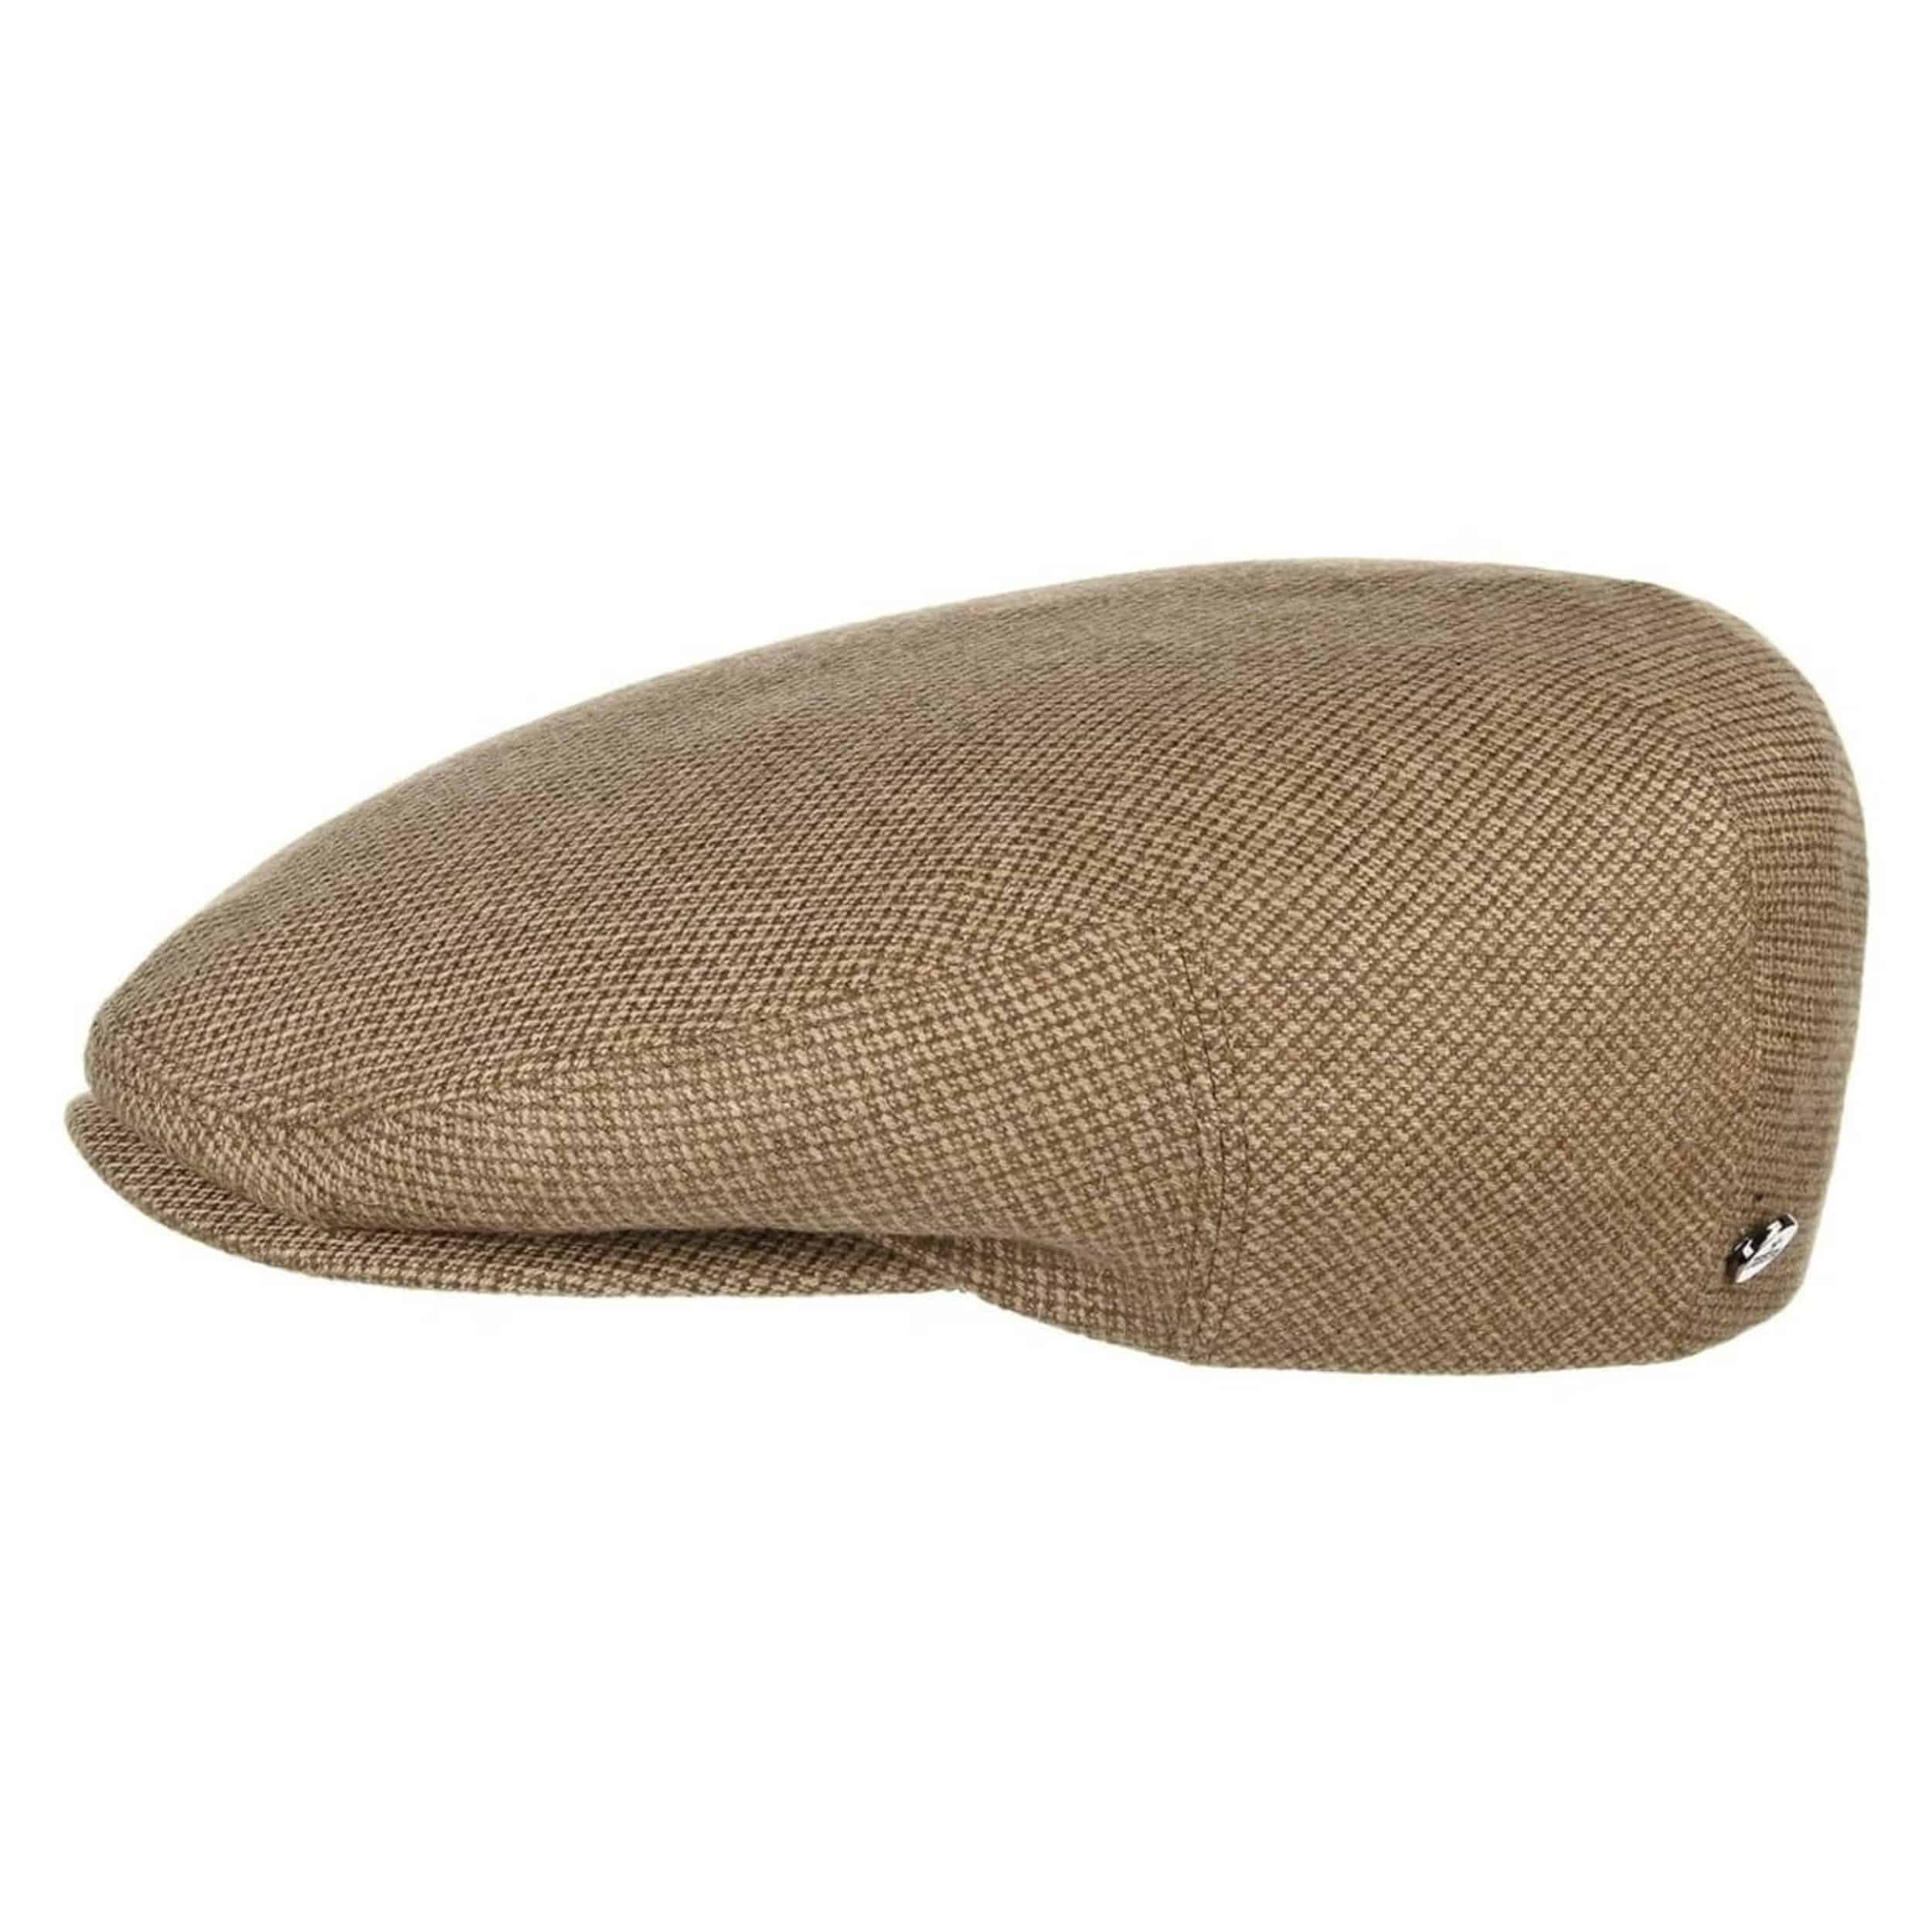 Camel Hair Bangor Flat Cap by Lierys, EUR 99,95 --> Buy hats, caps ...